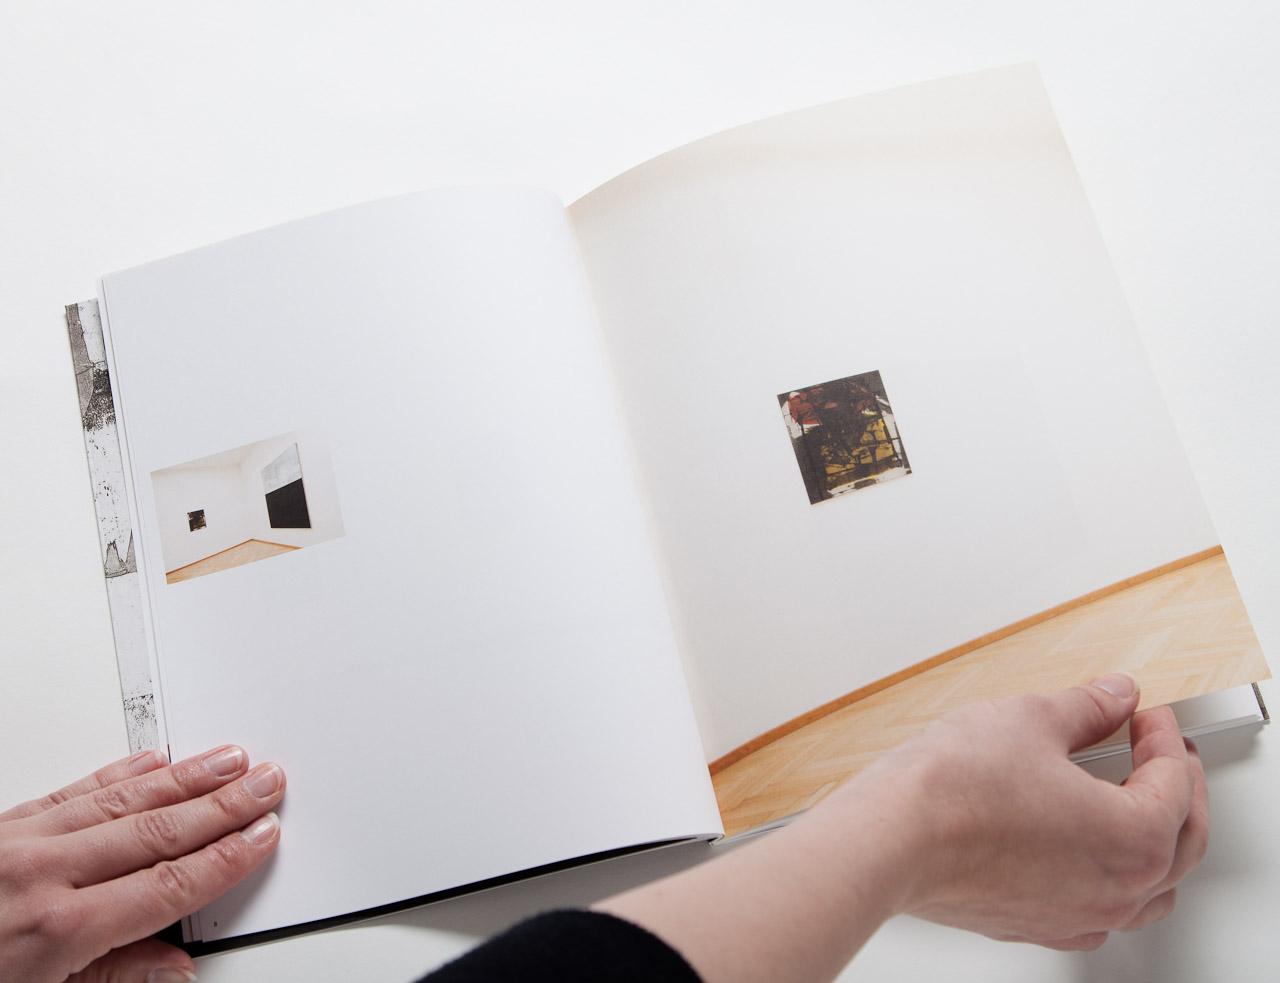 Erwin_Bohatsch_Katalog-8855